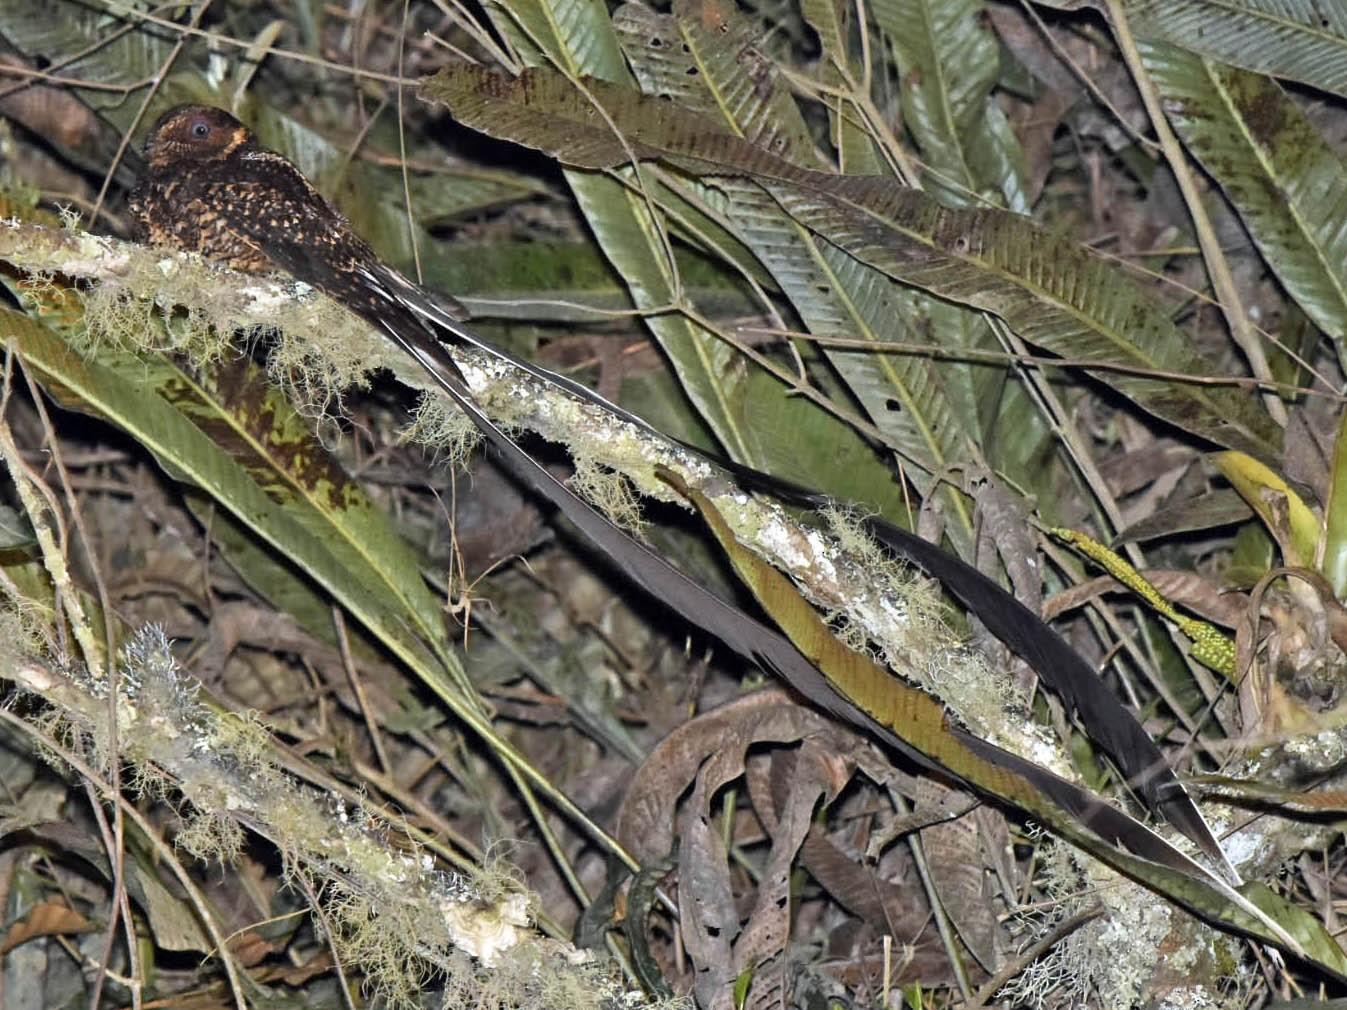 Lyre-tailed Nightjar - Tini & Jacob Wijpkema